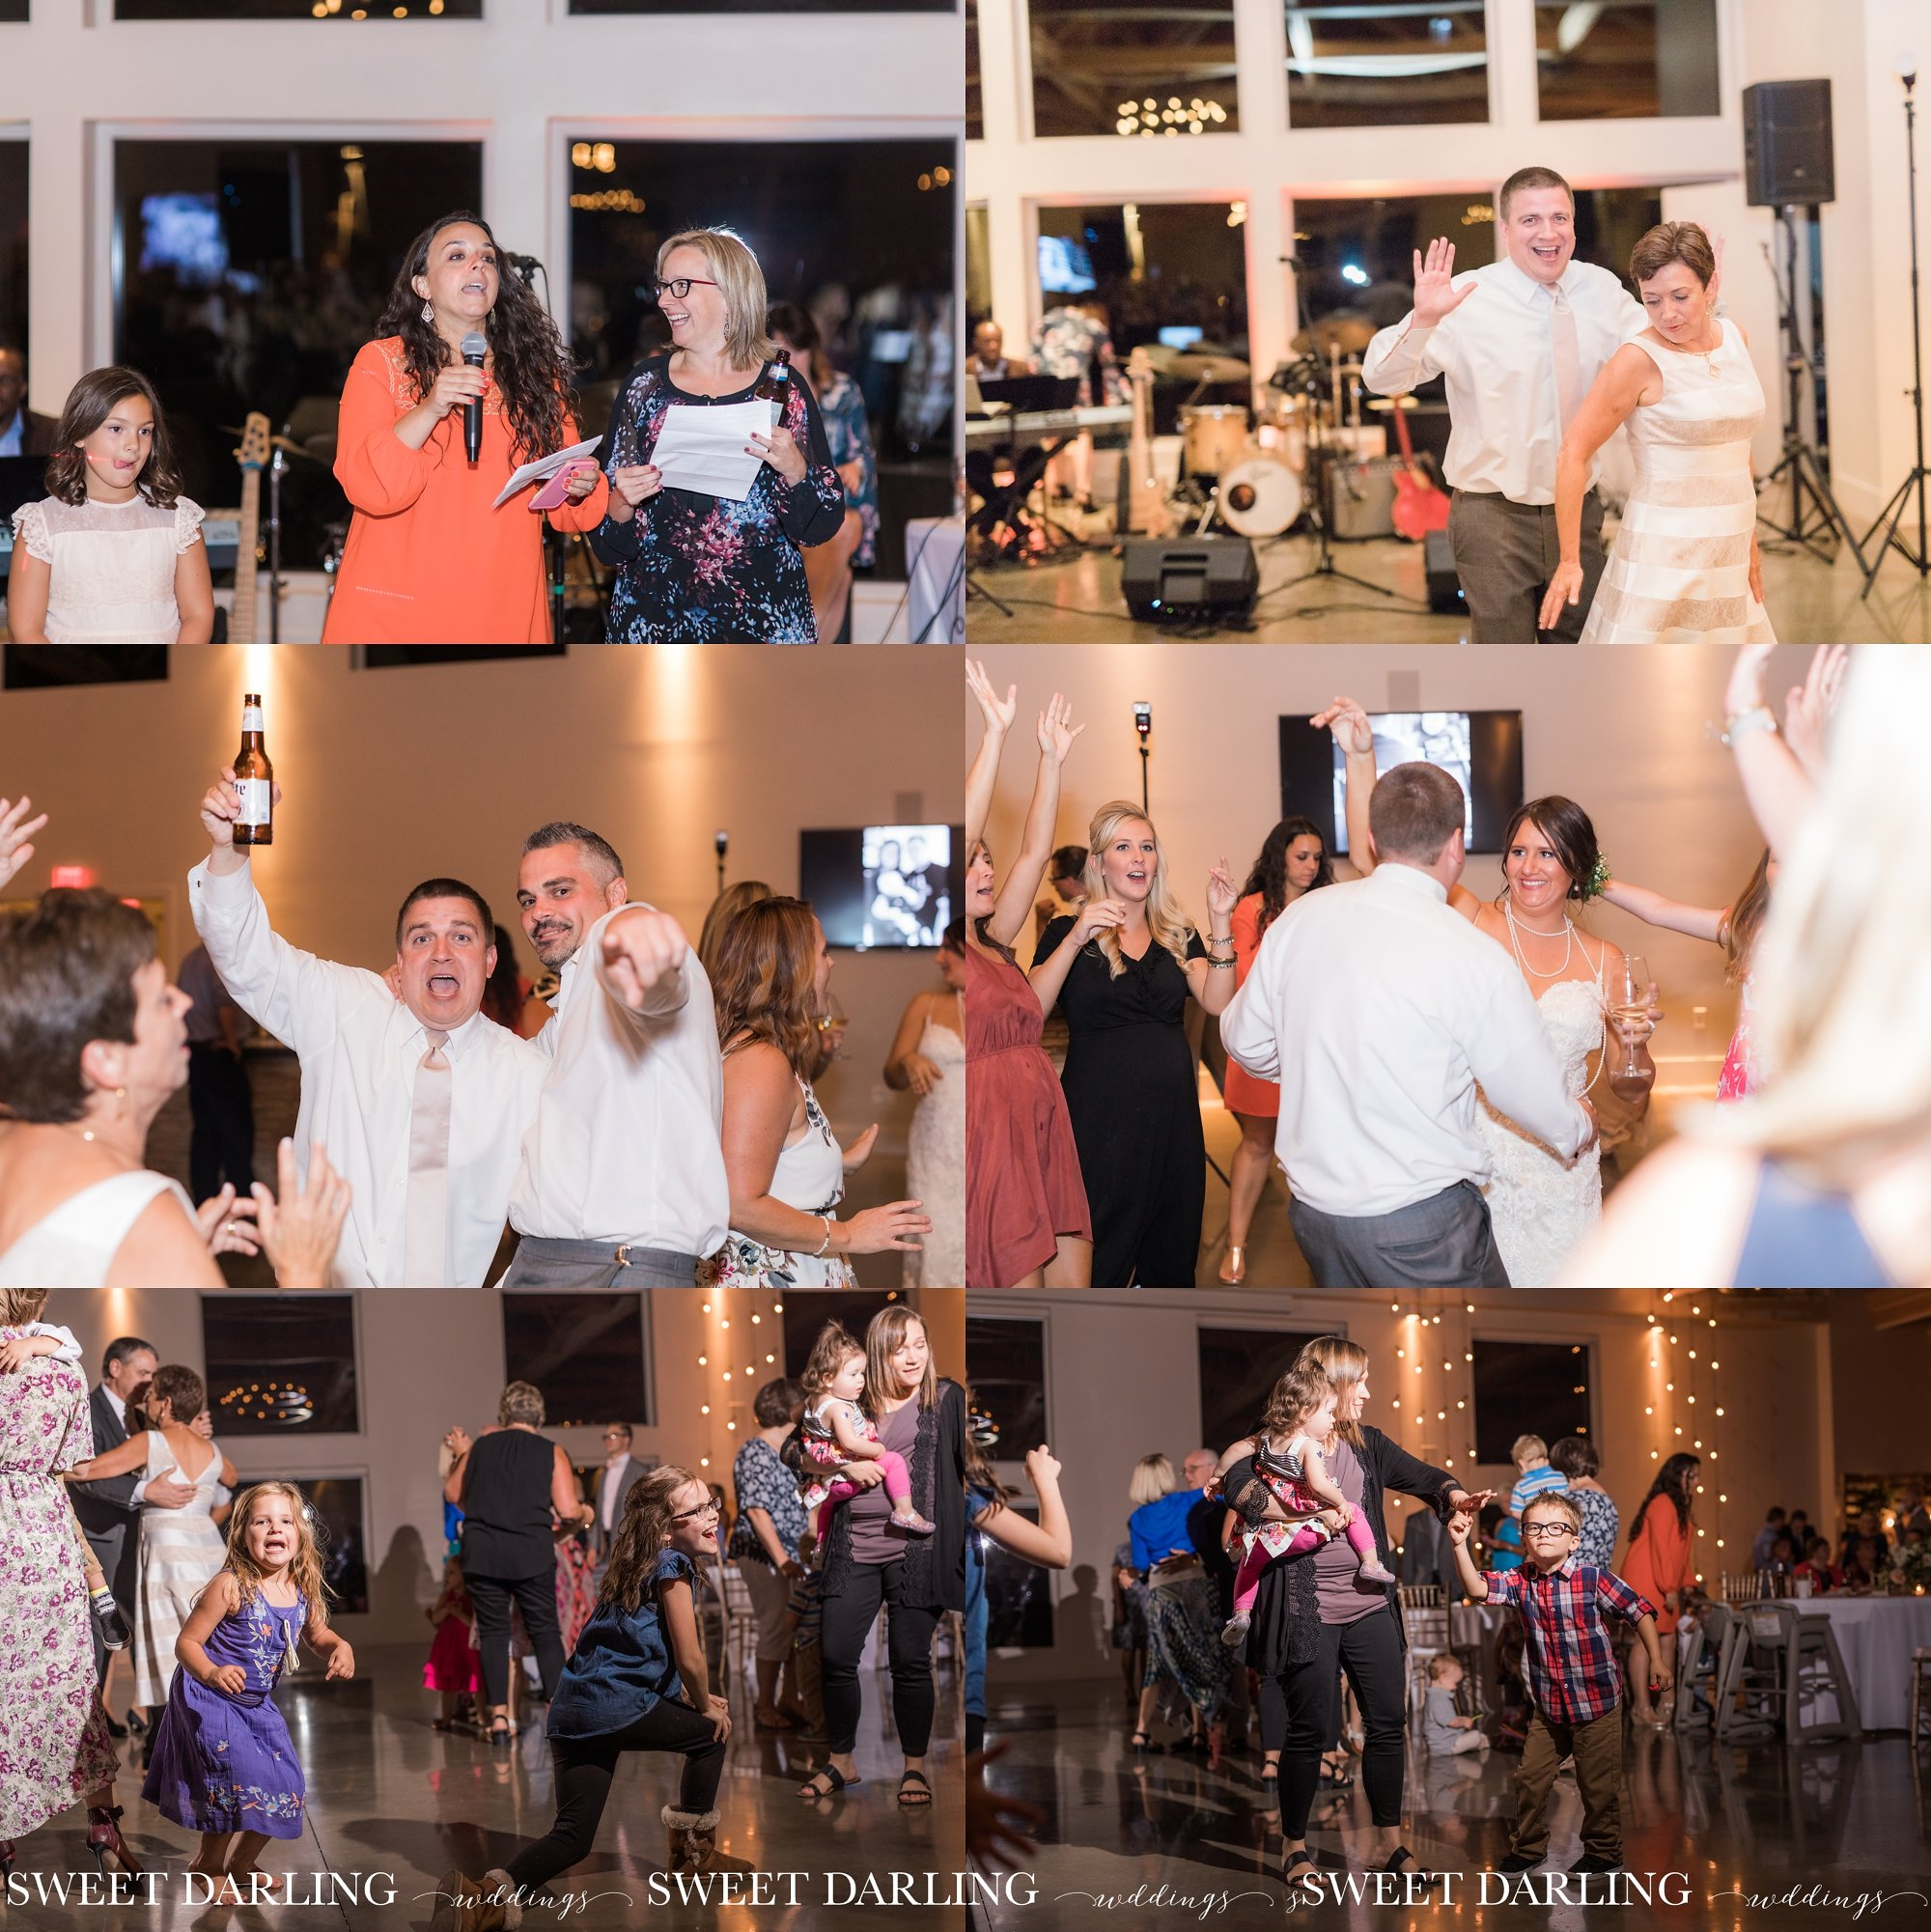 Dancing the night away at pear tree estate